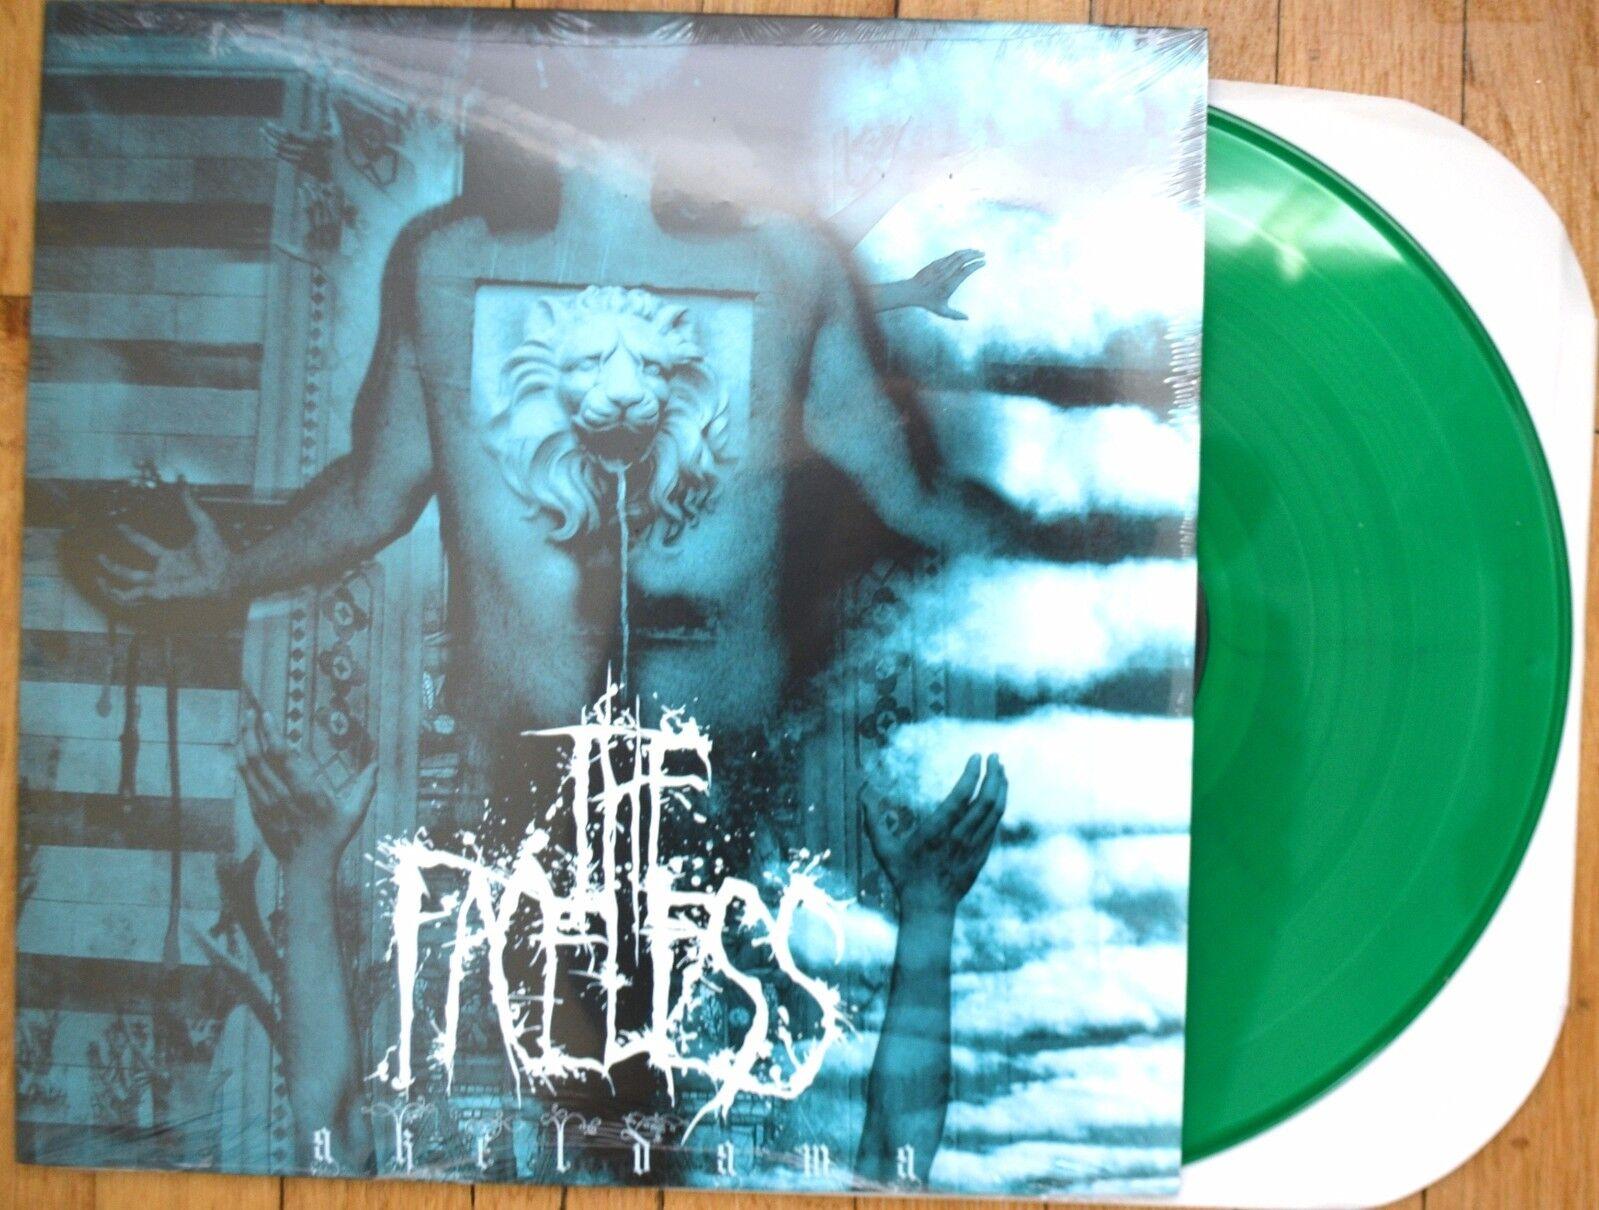 The Faceless Akeldama Vinyl LP Green New, autothiesm